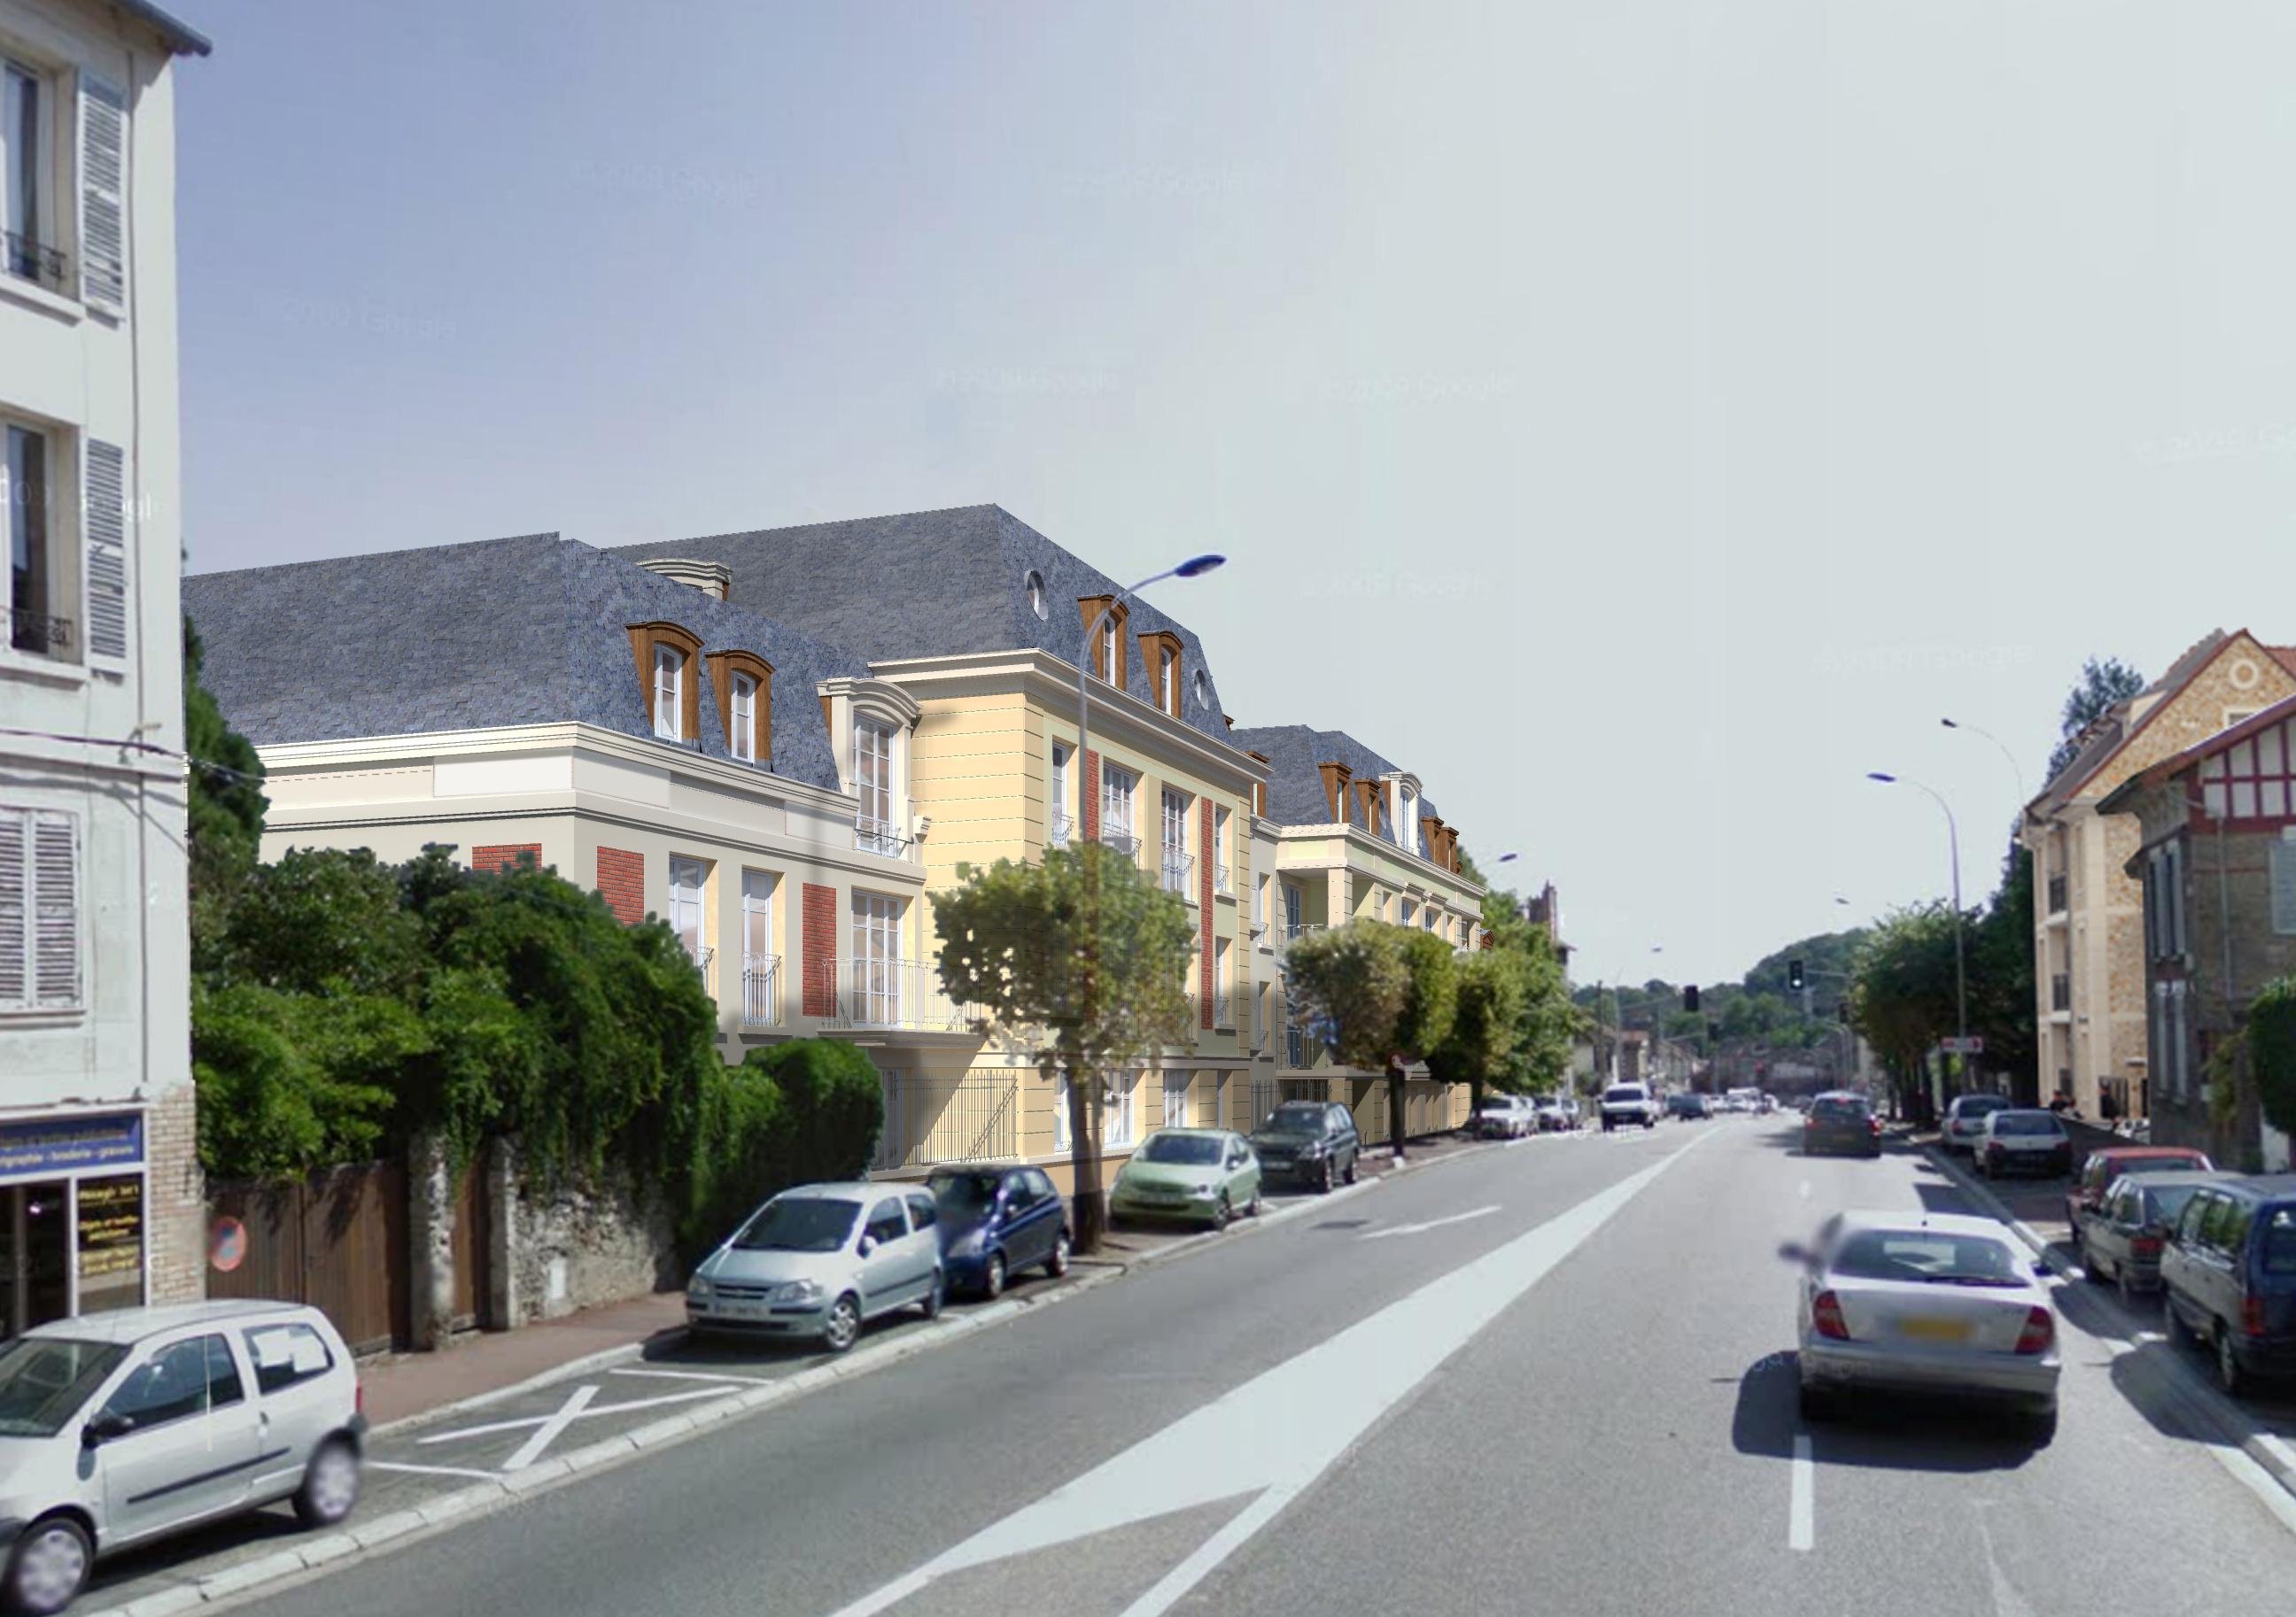 St-CyrLEcole rue Pierre Curie amont